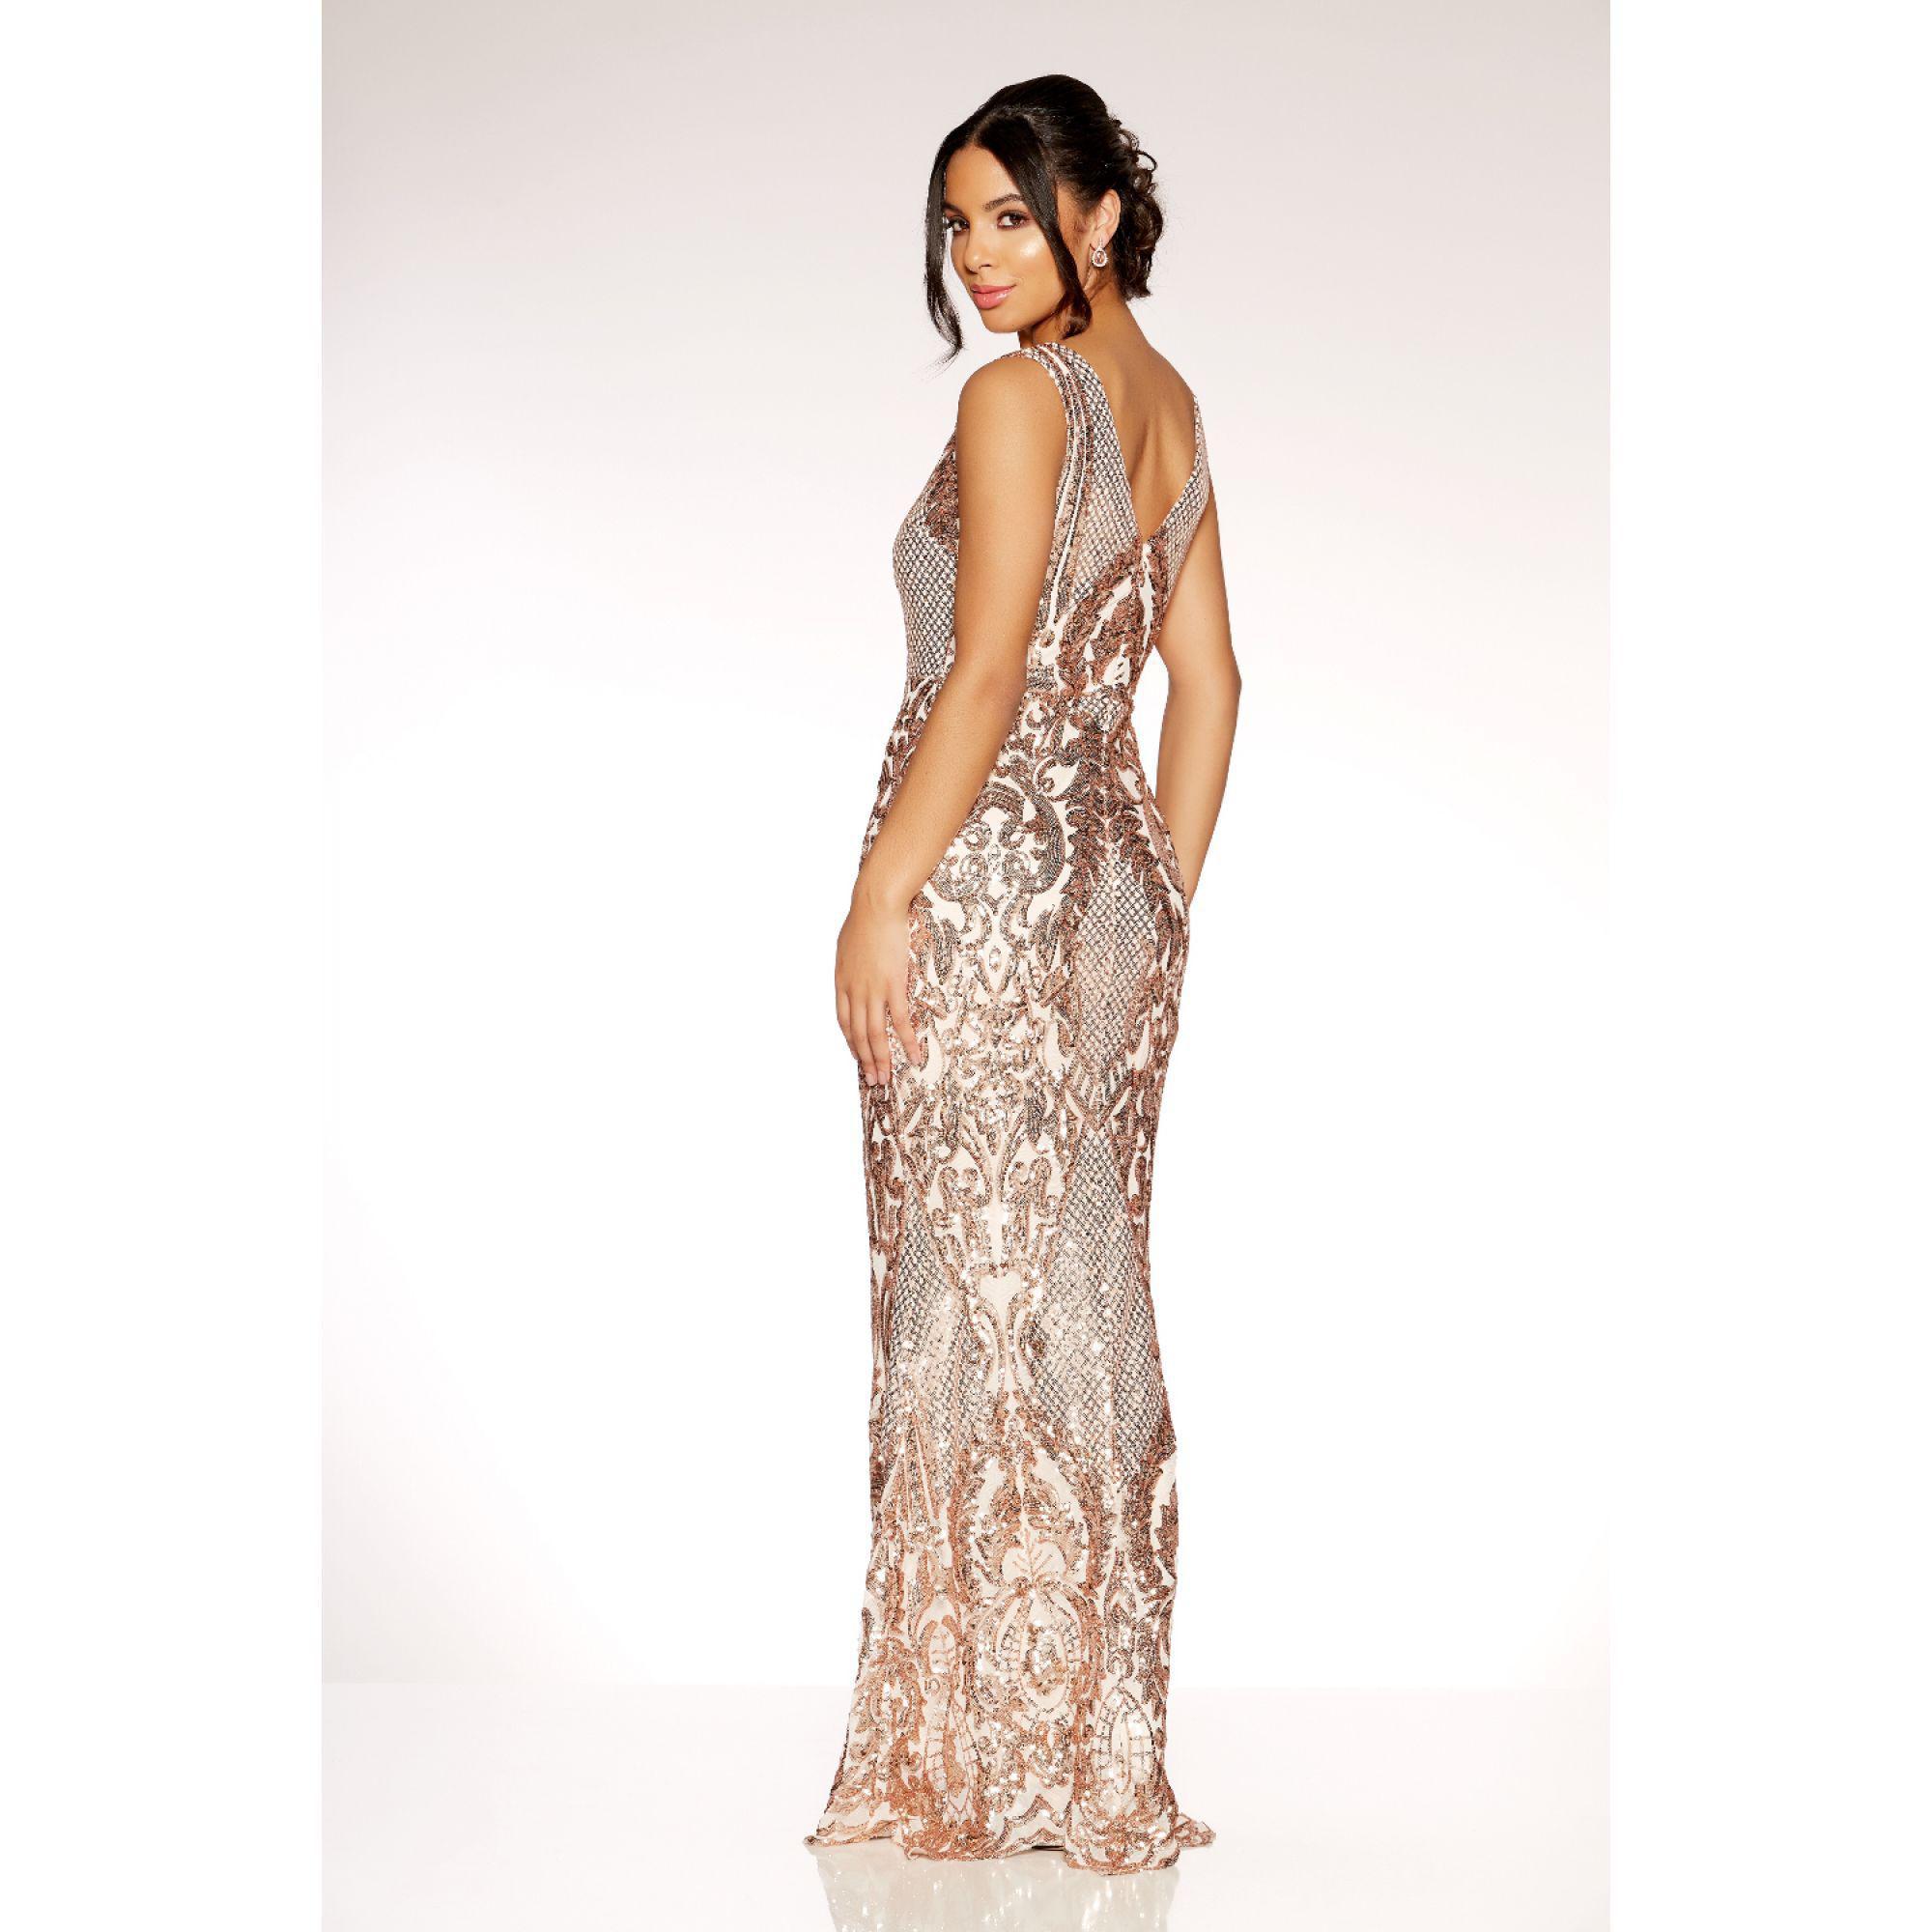 7fef8edabff3 Tap to visit site. Quiz - Metallic Rose Gold Sequin Mesh High Neck Fishtail Maxi  Dress ...